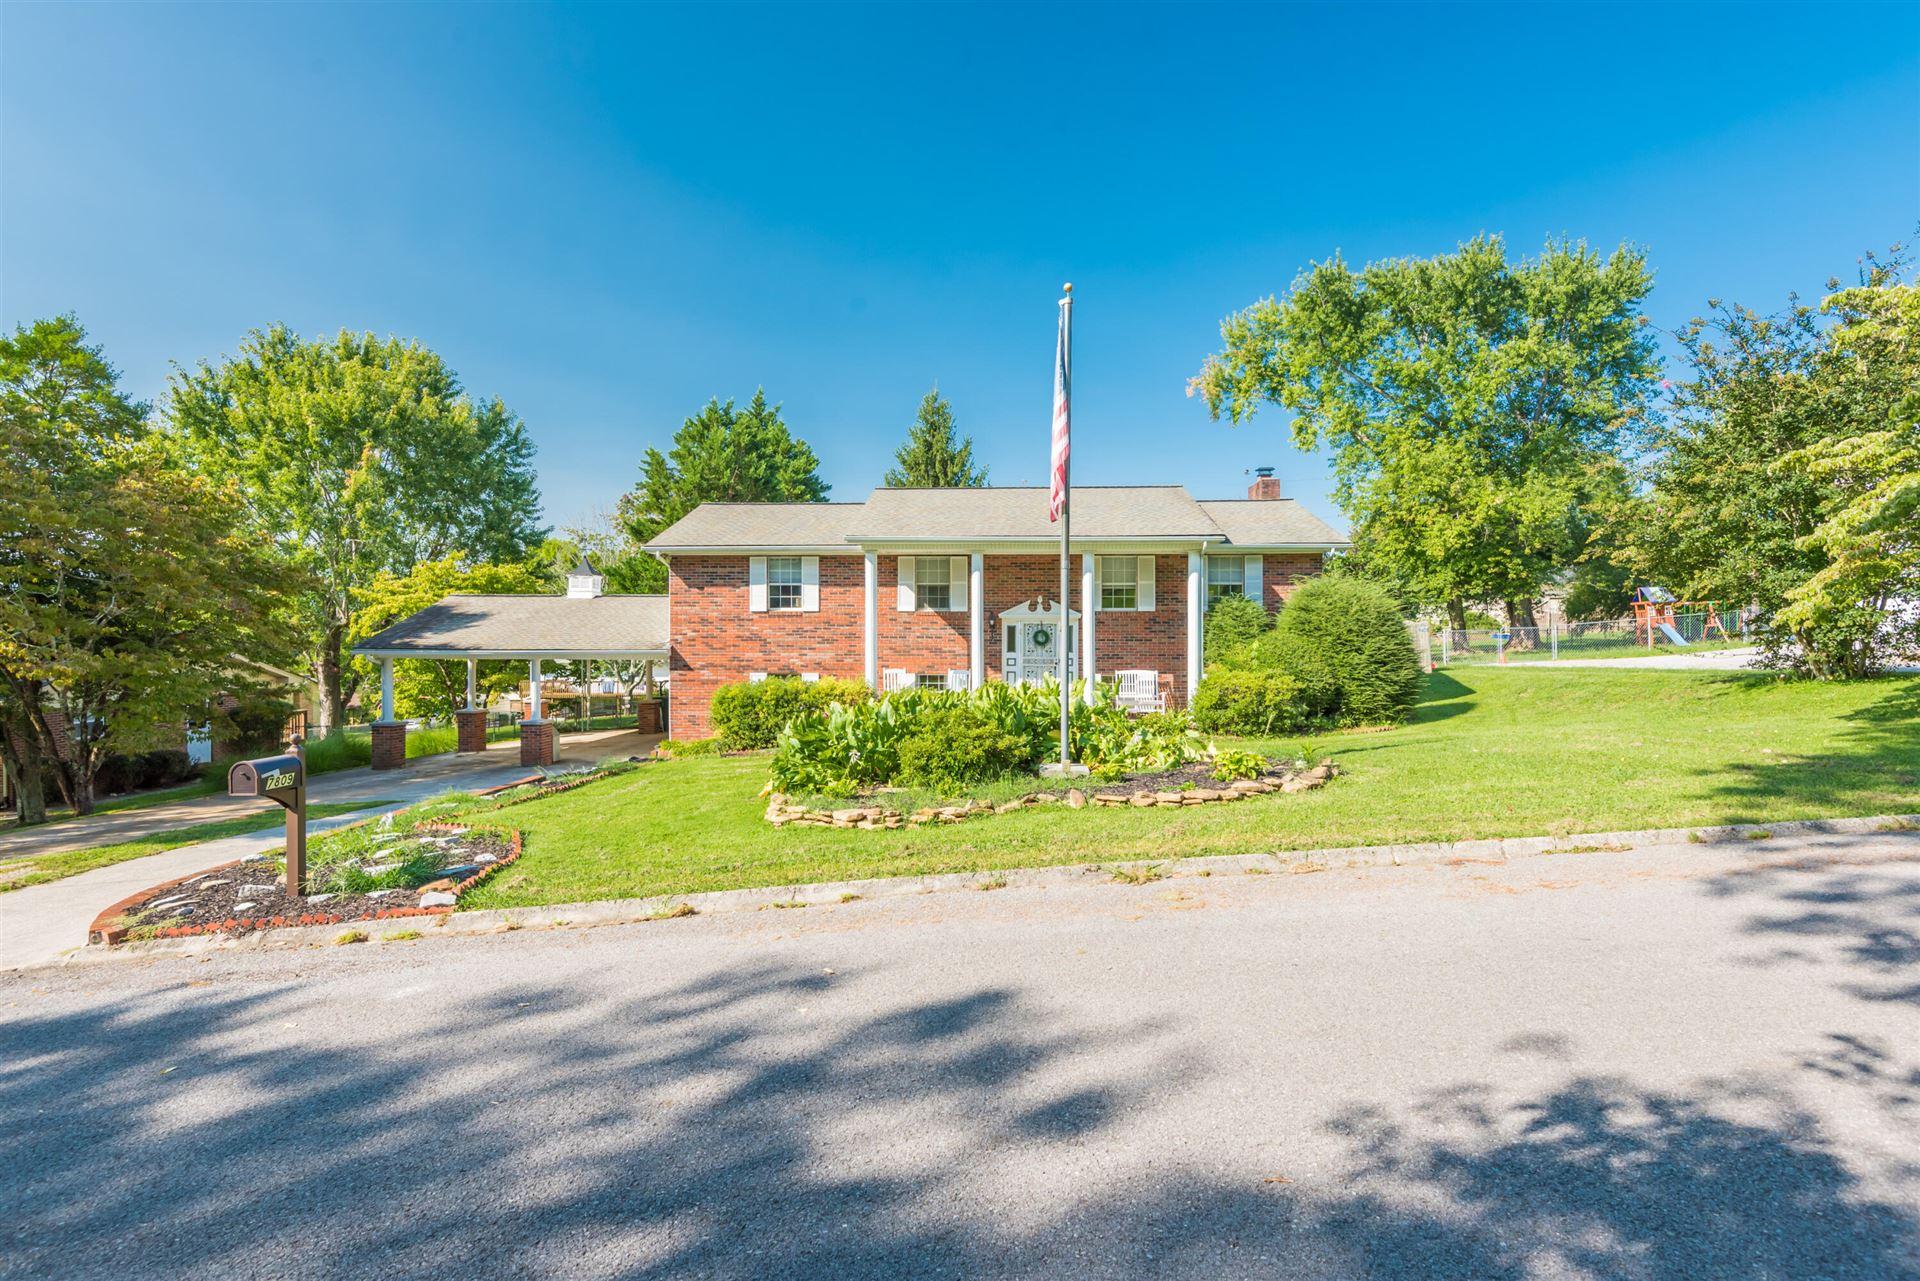 Photo of 7809 Whitcomb Rd, Powell, TN 37849 (MLS # 1167346)